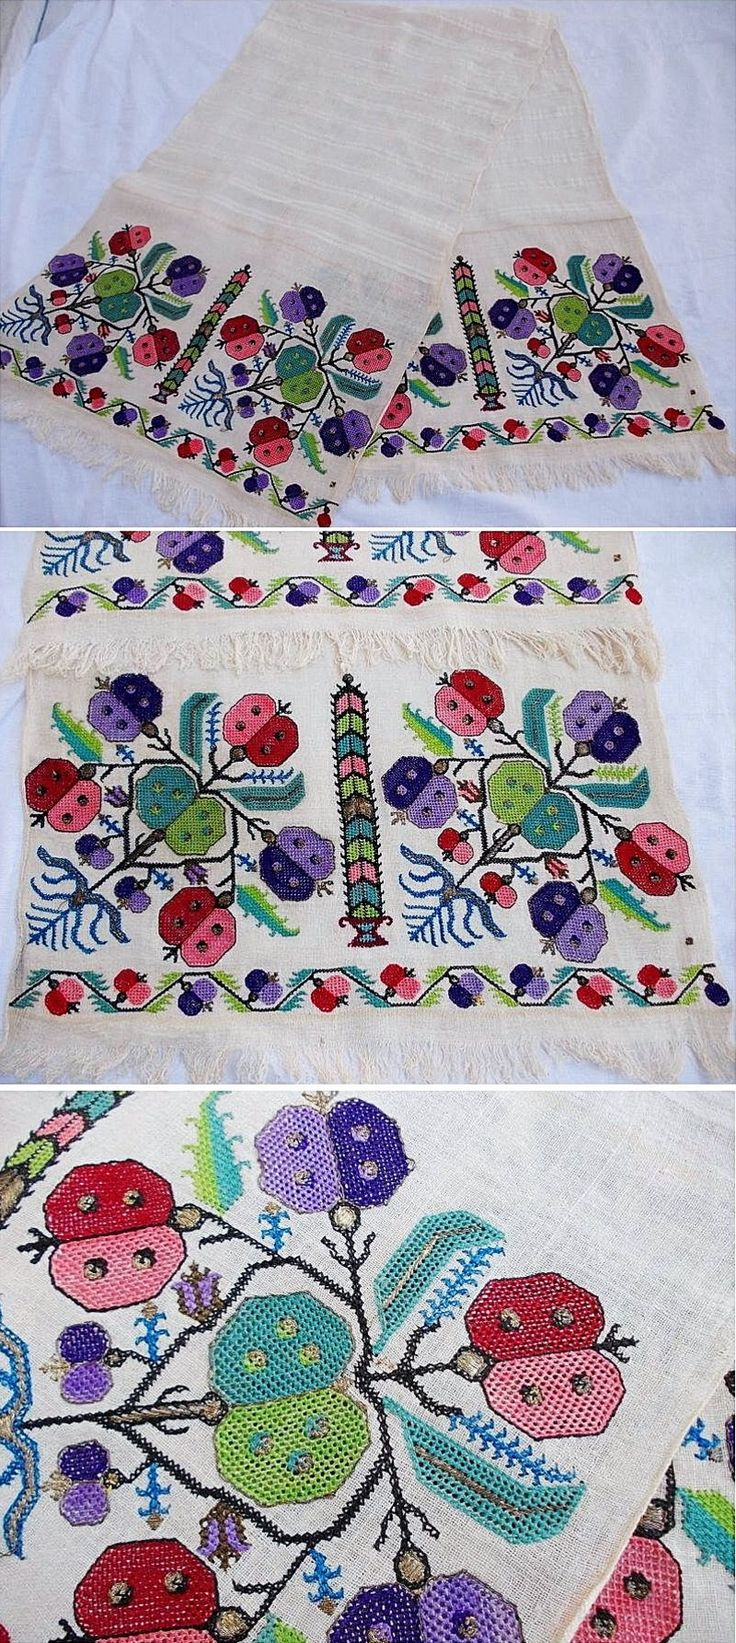 Embroidered 'yağlık' (large handkerchief, part of traditional festive costumes, usually worn in the waist belt).  From the district of Ödemiş (prov. Izmir), late-Ottoman era, early 20th century.  (Source: Antika Osmanlı Tekstil, Istanbul).